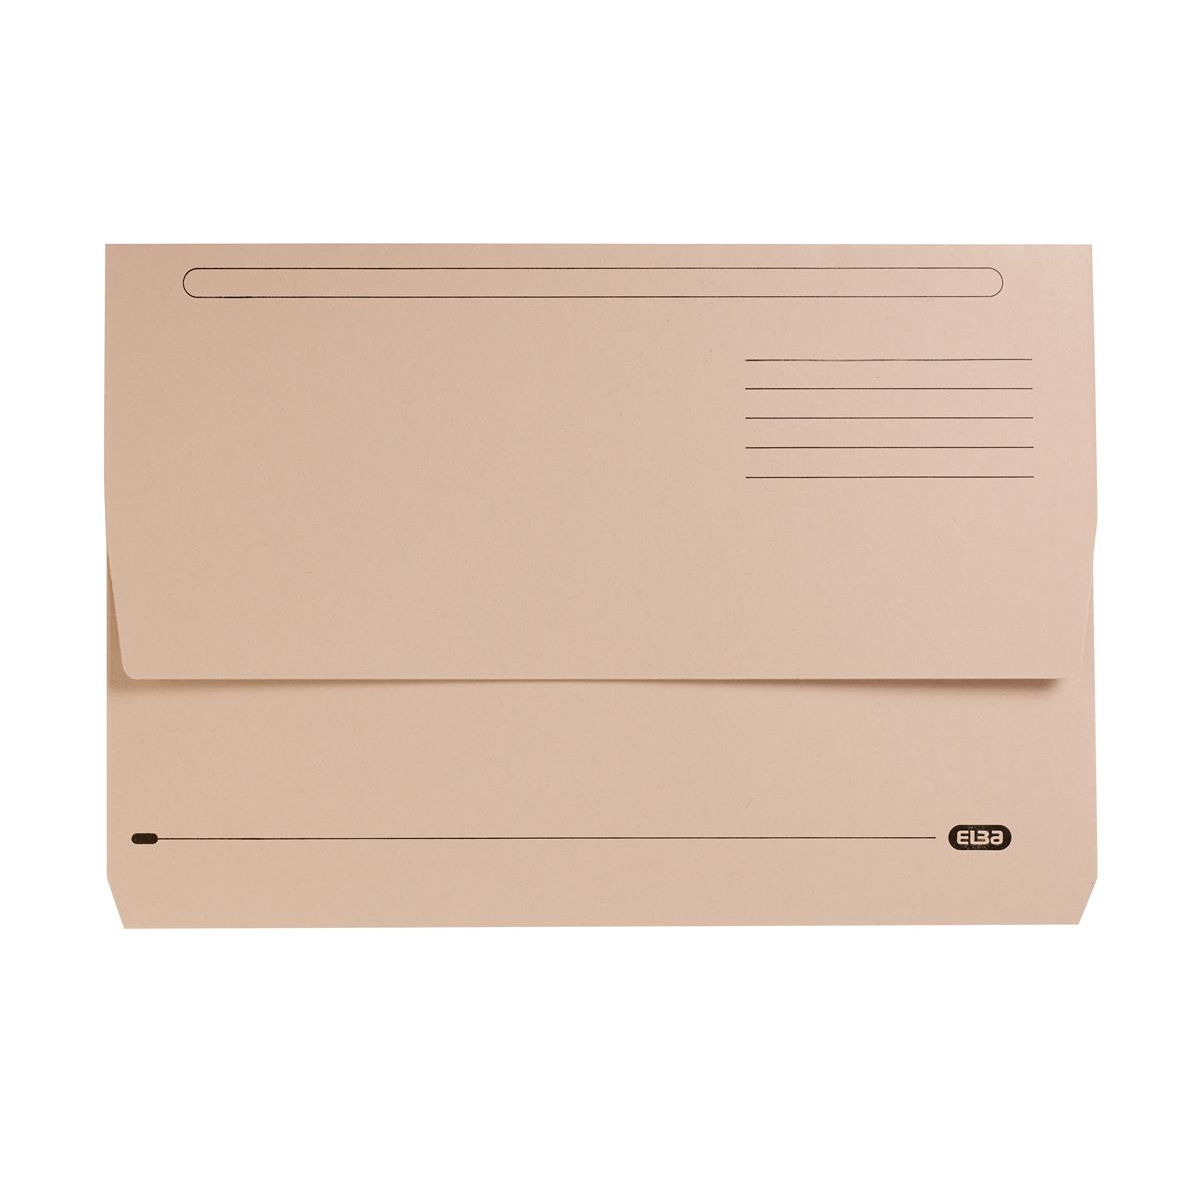 C003092